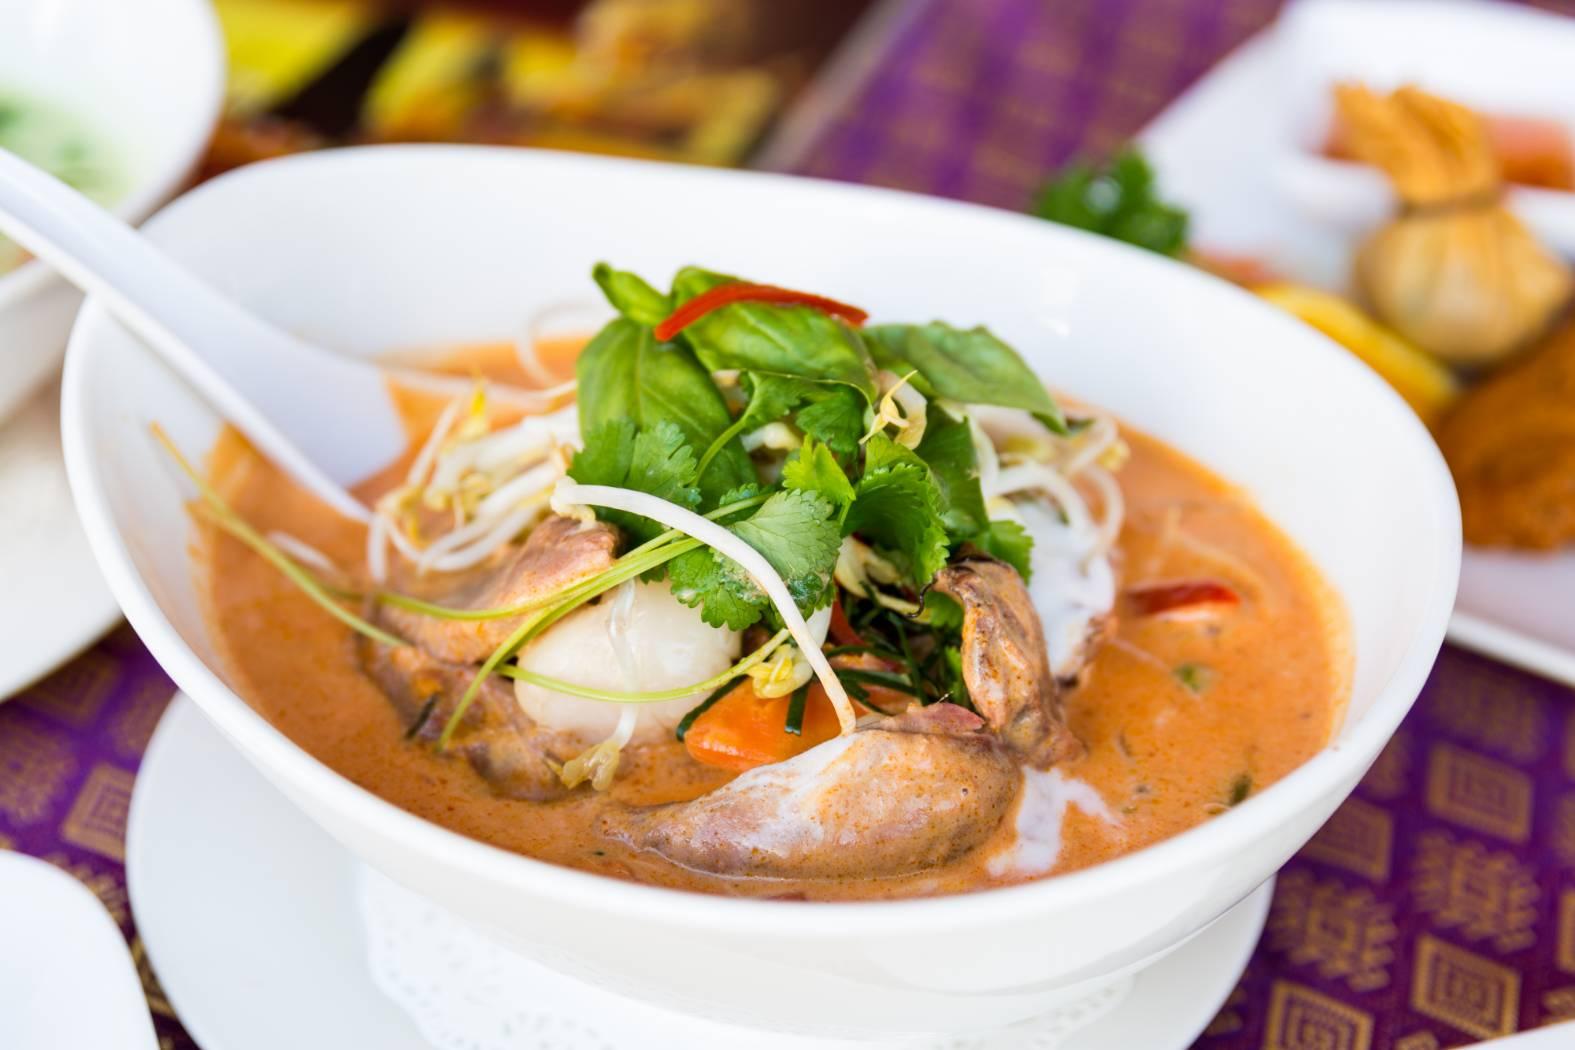 Thai%20thani%20restaurant%20tauranga%20%286%29_1575x1050